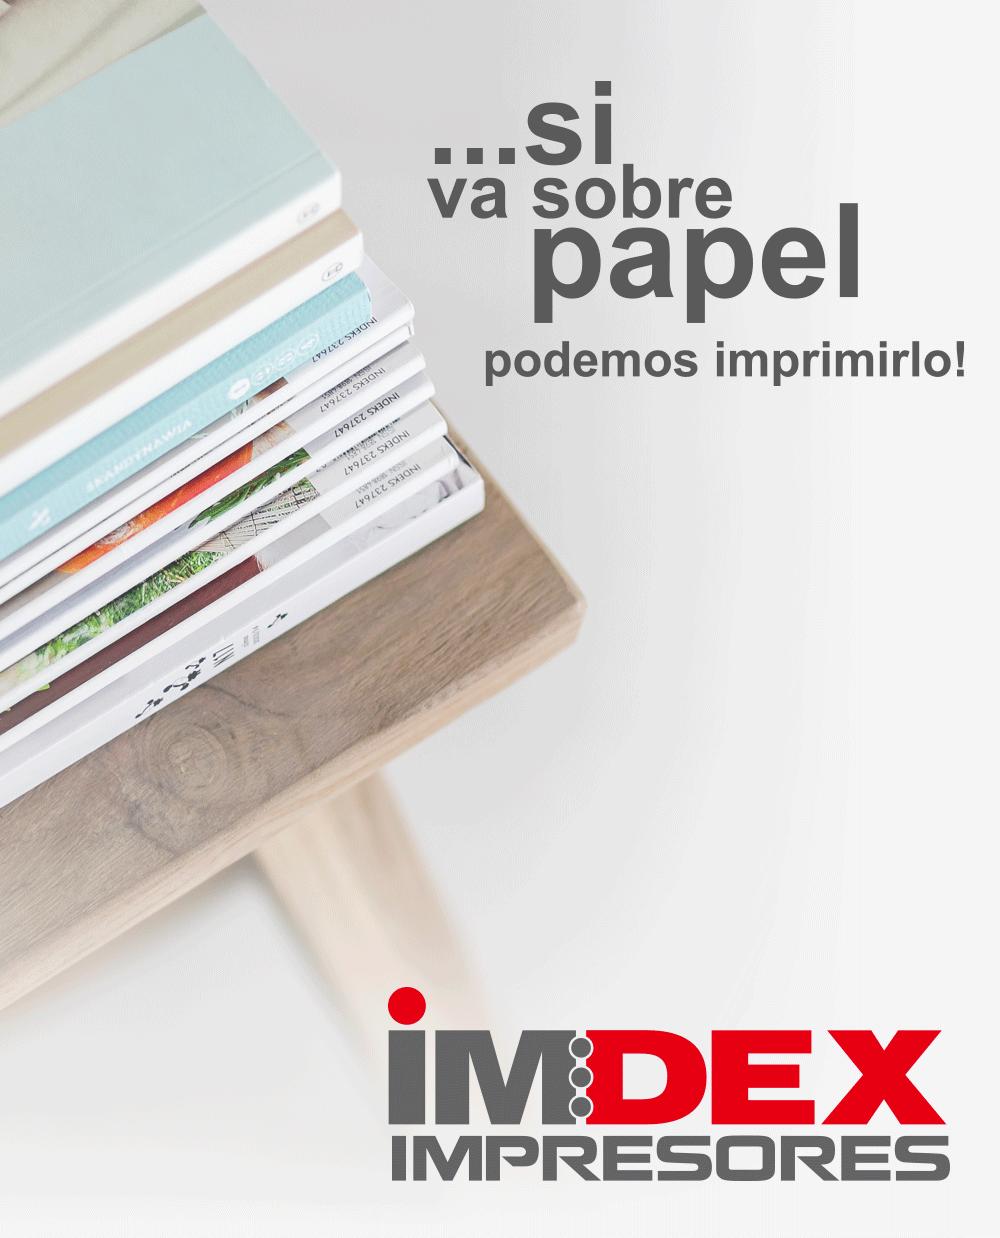 IMDEX Impresores. Si va sobre papel, podemos imprimirlo.